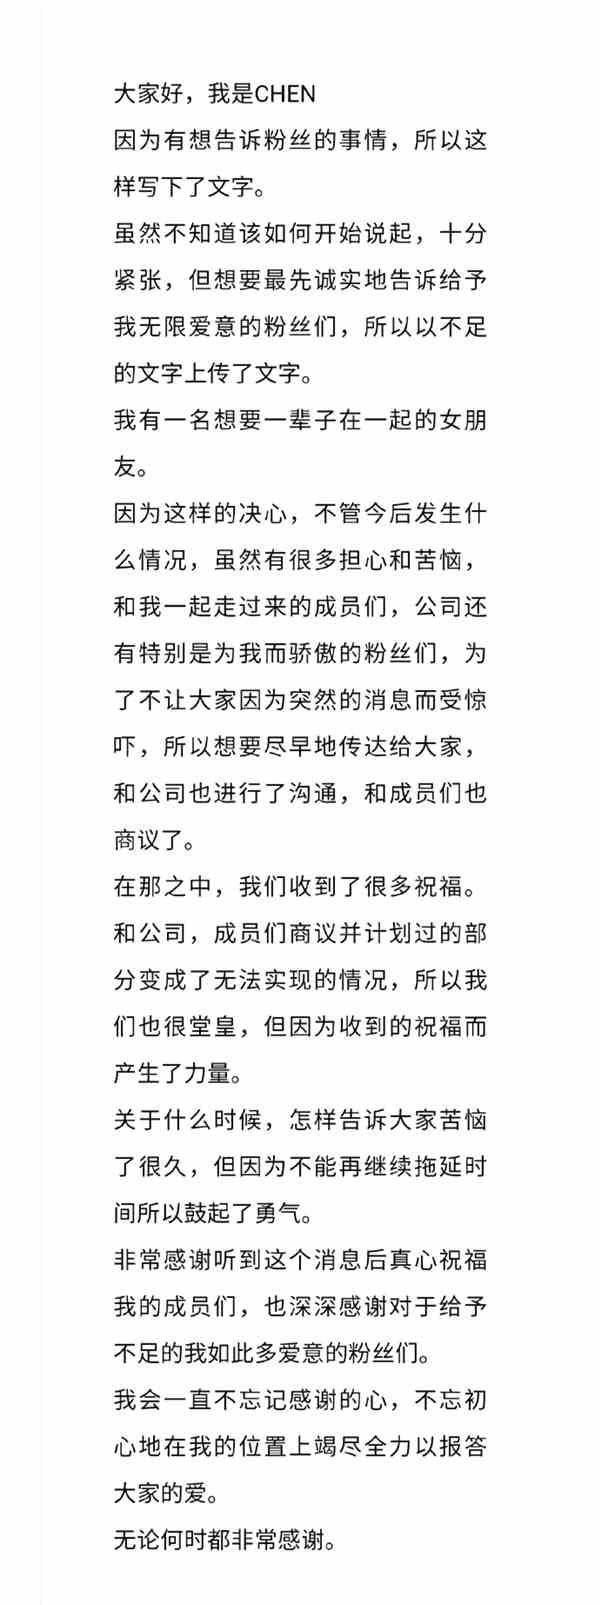 SM确认金钟大结婚 并确定chen即将升级当爸爸